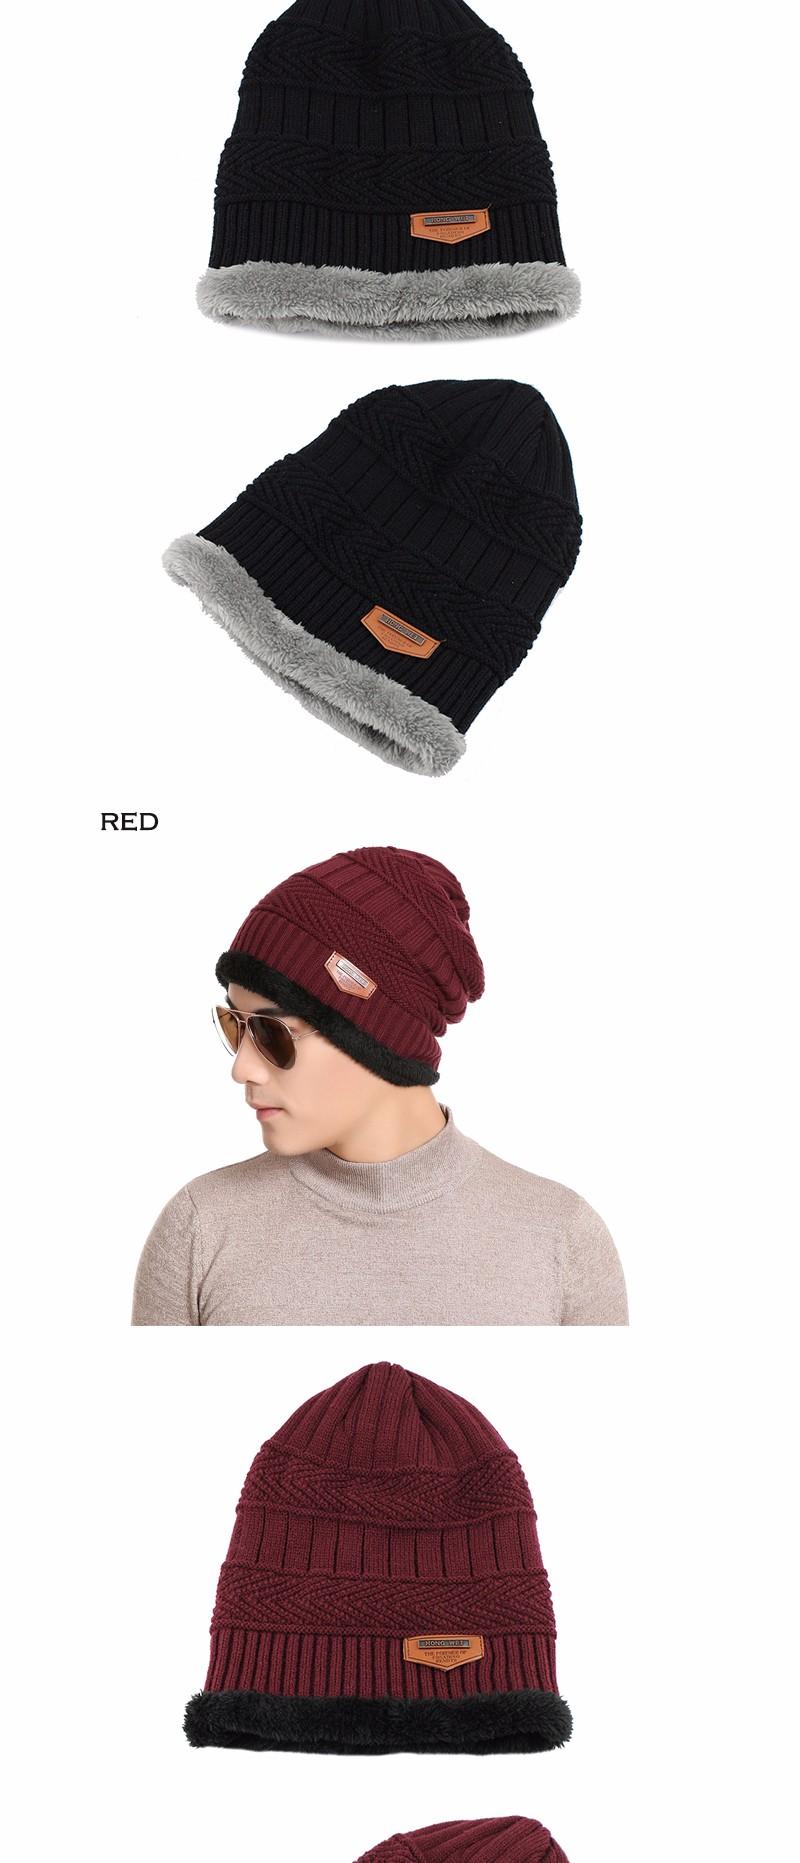 FETSBUY Pure Color Winter Skullies Beanies Hat Knit Winter Hat For Man Warm Hat Velvet Cap Bonnet Toucas Inverno Knitted Hats 16